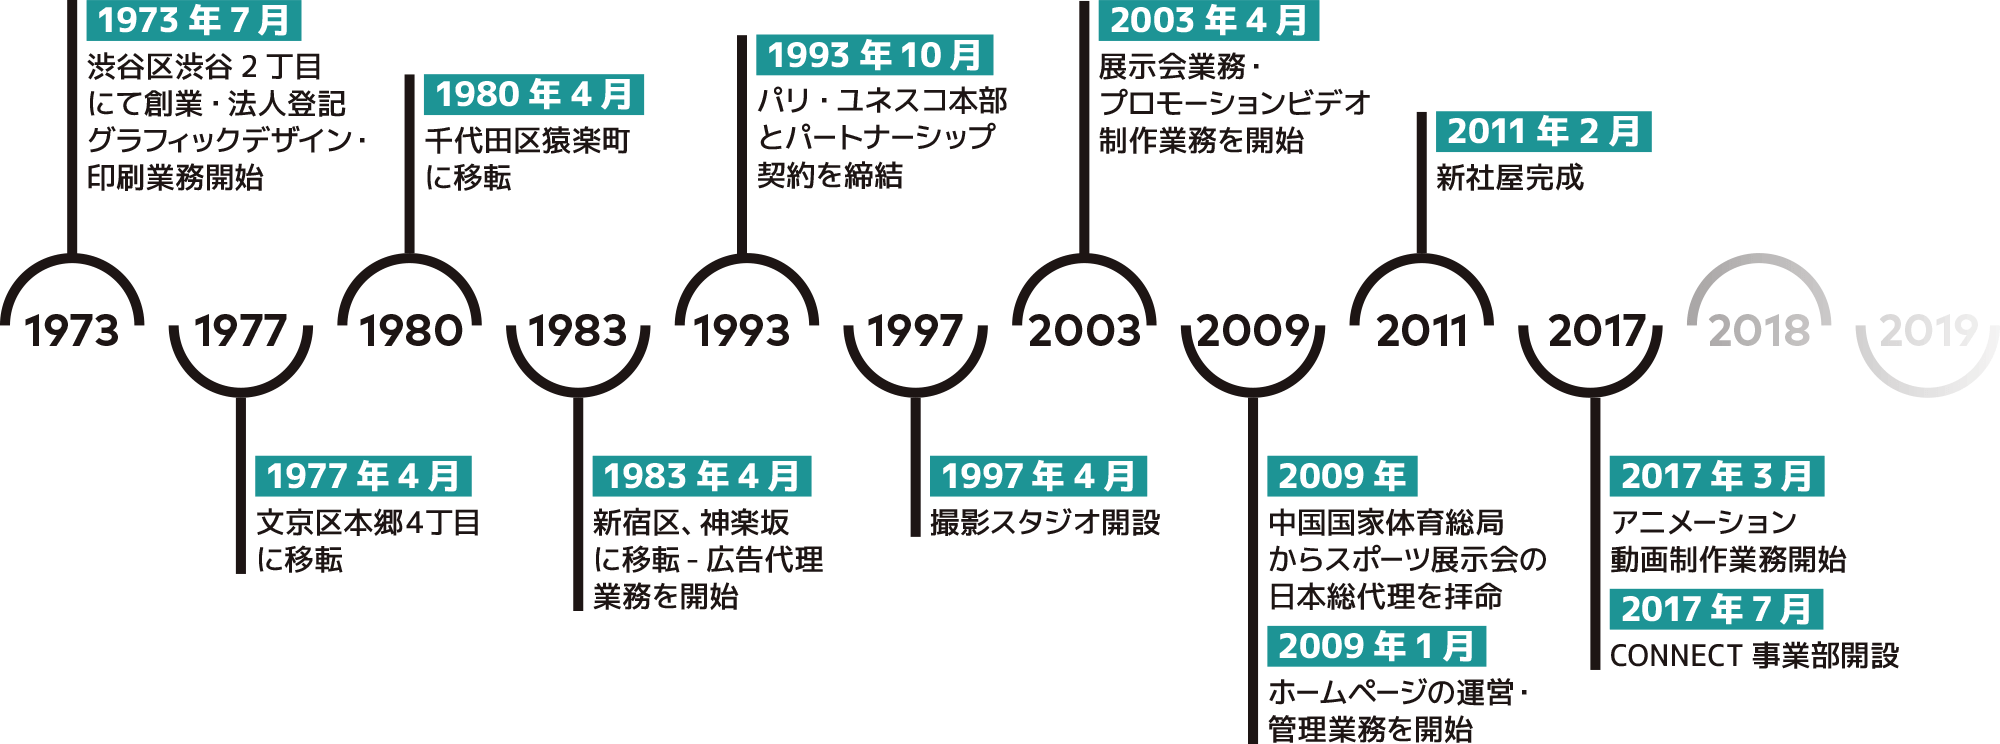 kobi timeline